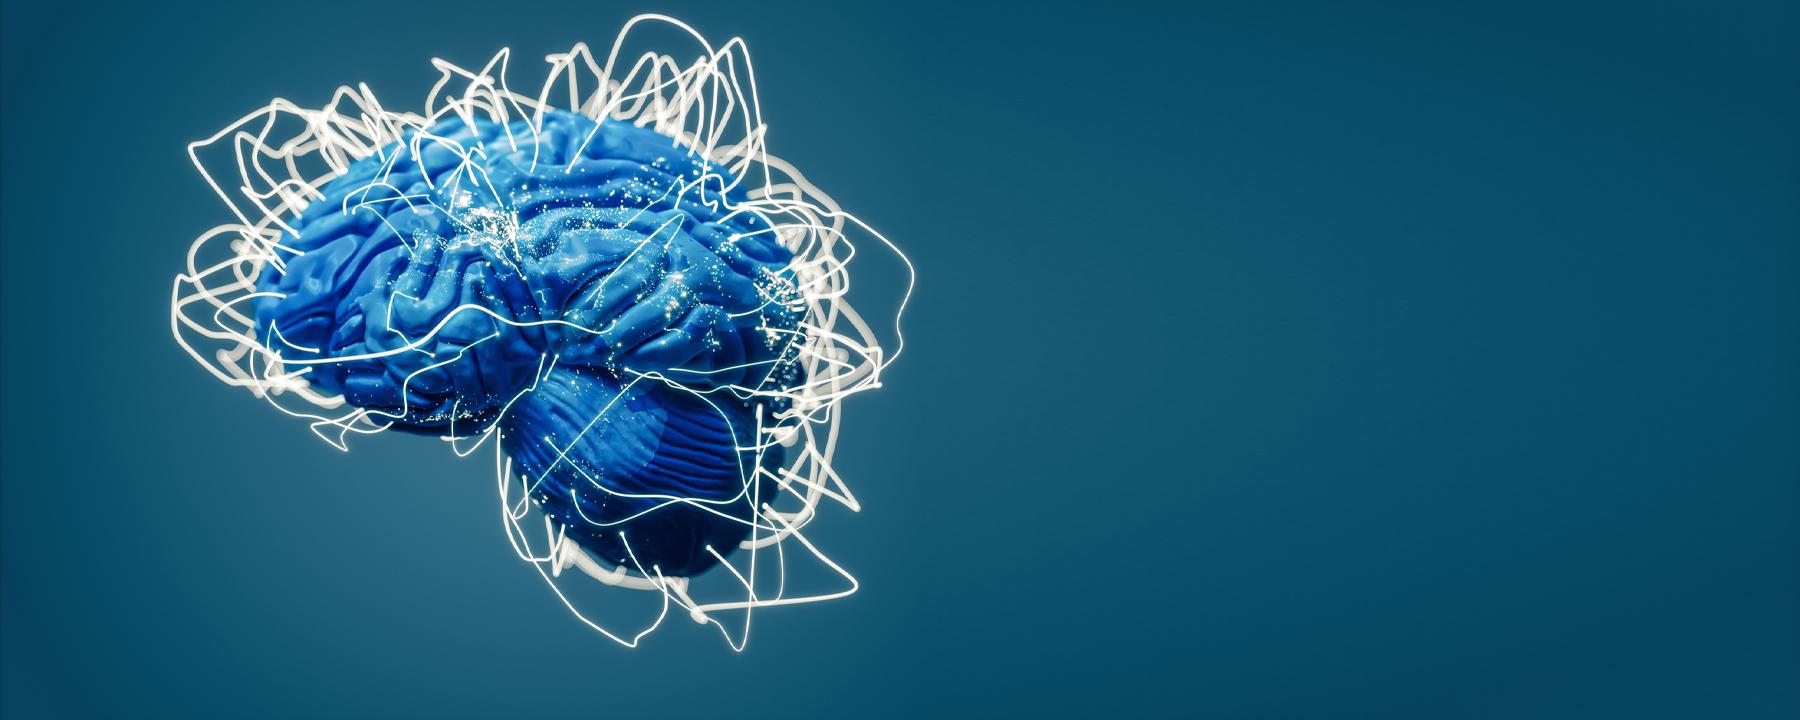 The Cerebellum's Secrets: A Profile of Kamran Khodakhah